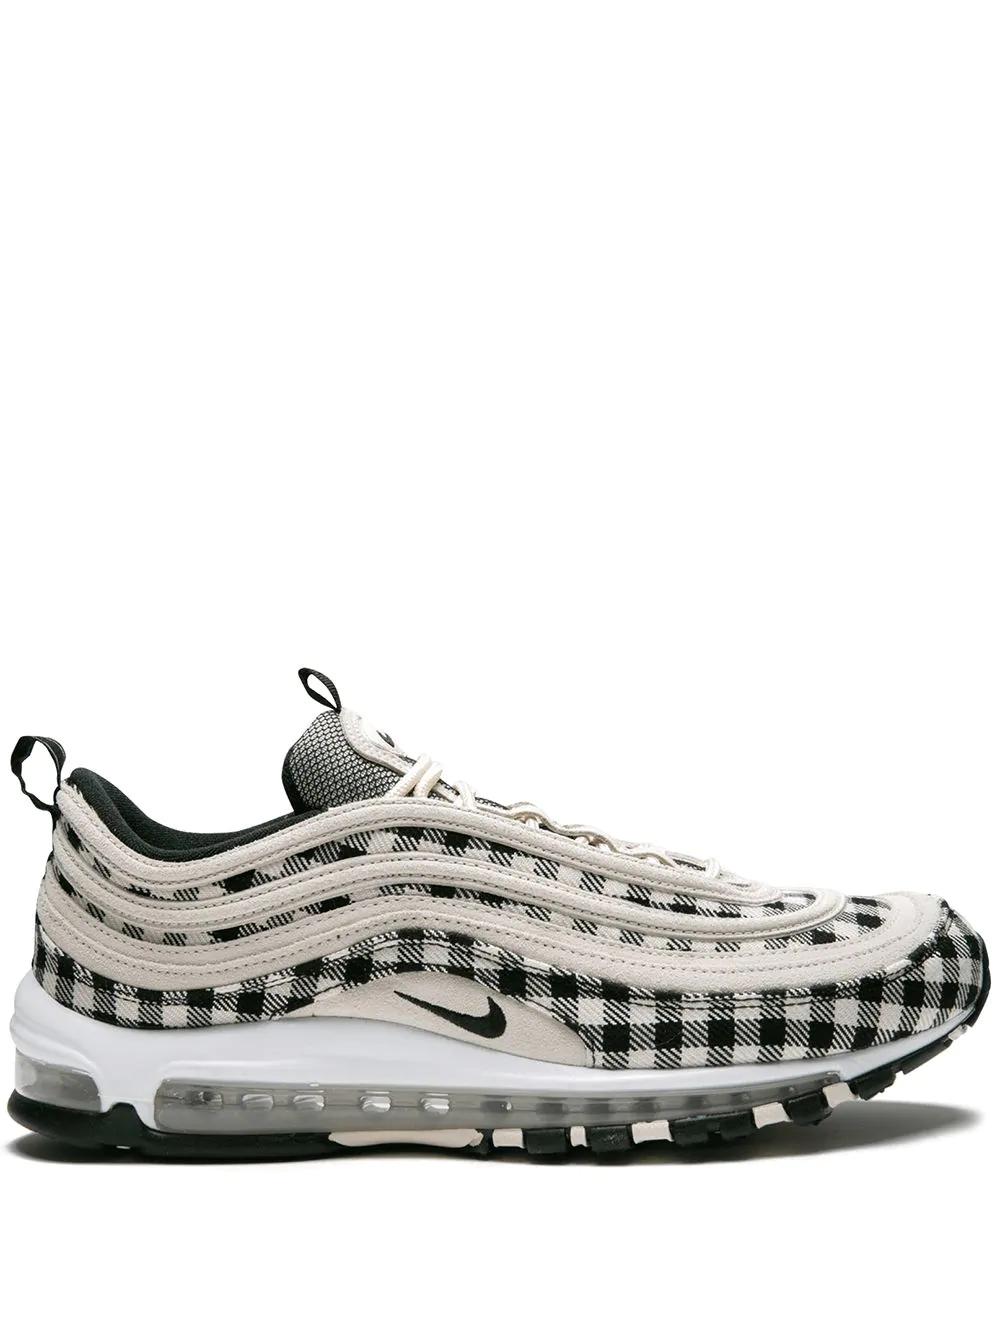 f13a0cd366 Nike Air Max 97 Premium Sneakers - White | ModeSens